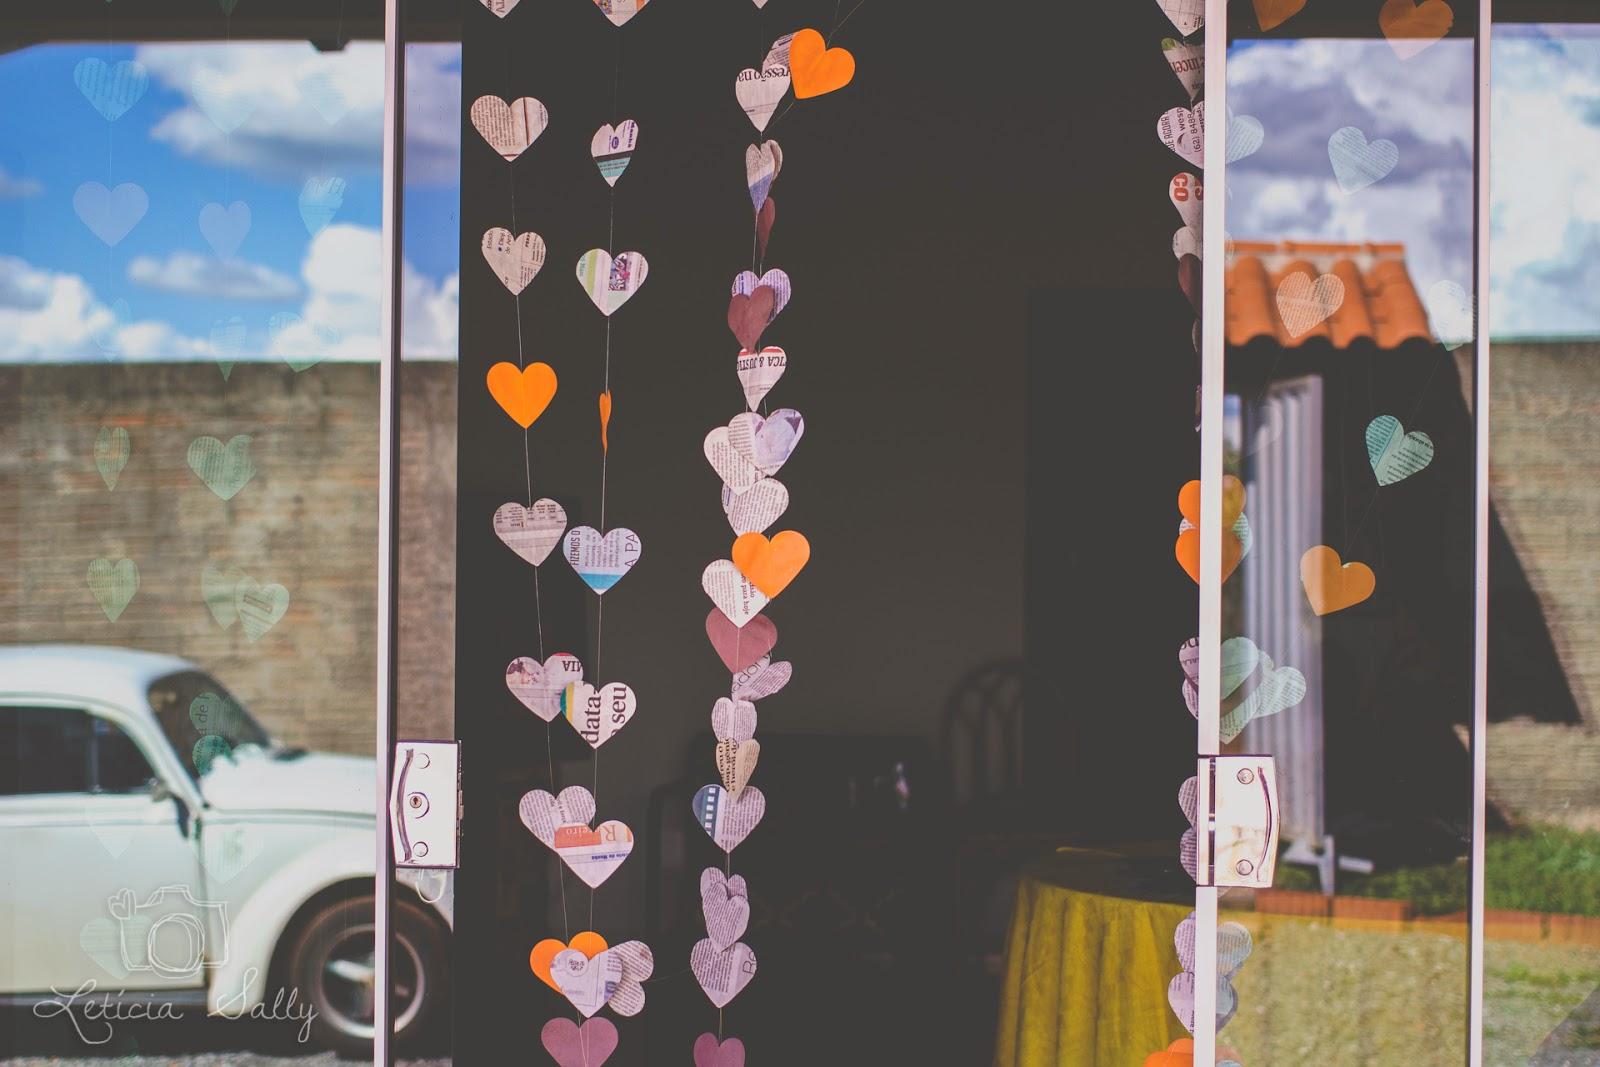 cha-panela-rustico-simples-cortina-coracoes-1